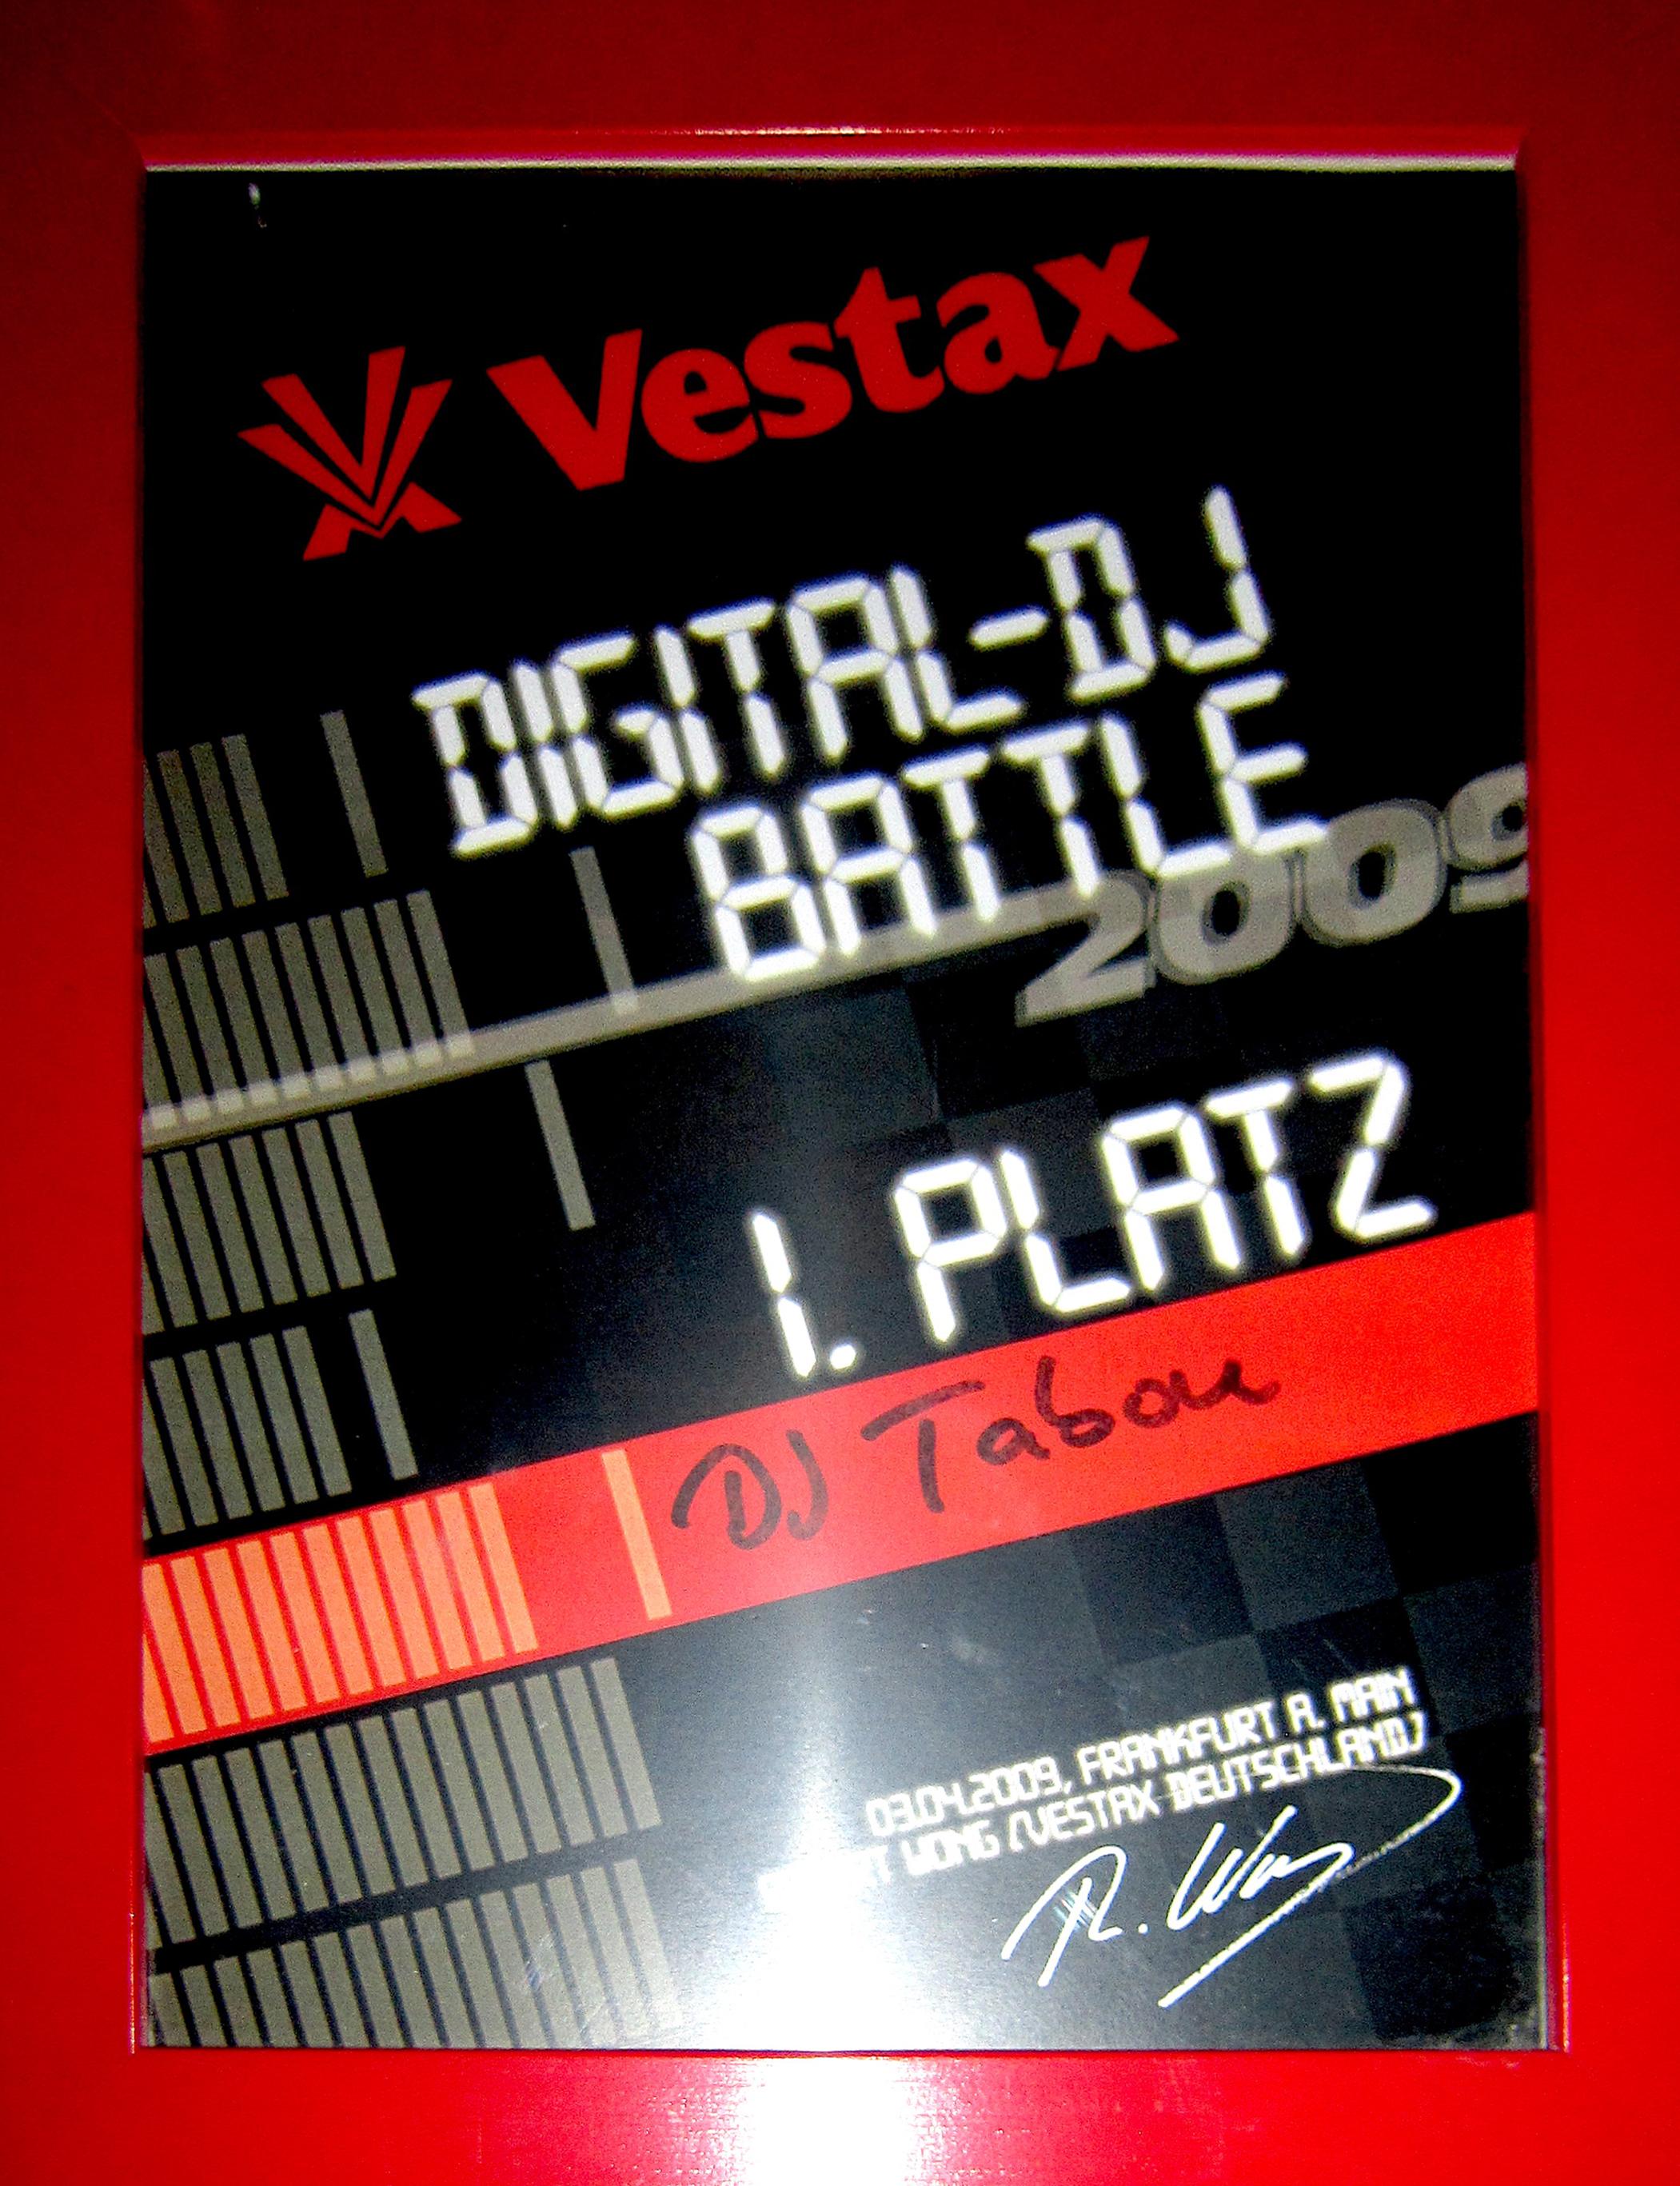 Vestax DJ Battle 1.Platz 2009.jpg